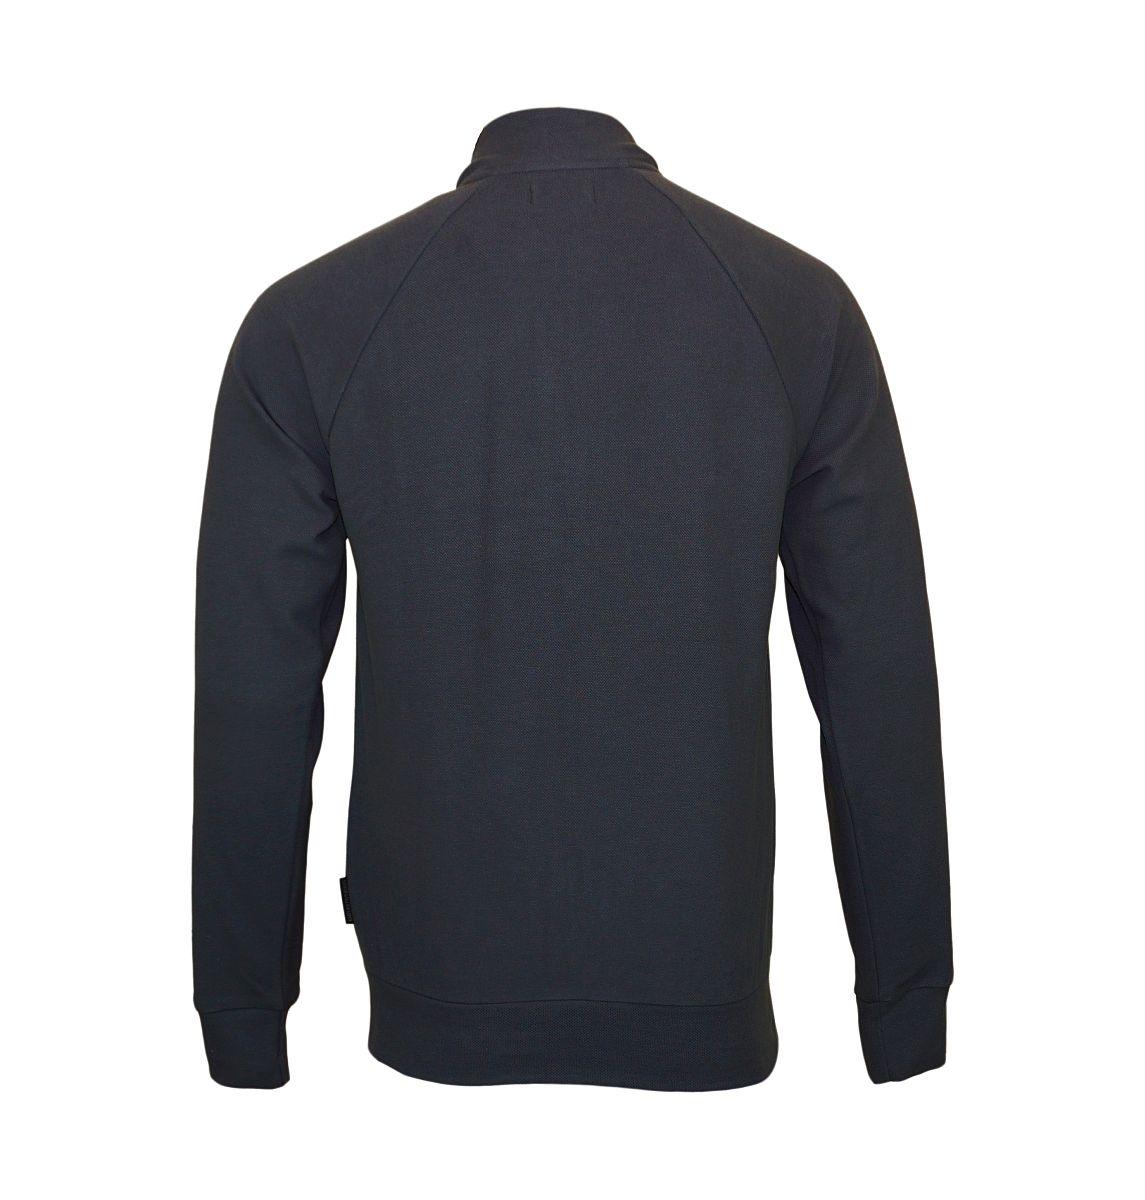 Emporio Armani Sweater Jacke Sweatjacke 111570 7A569 08444 FUMO HW17-EAS1